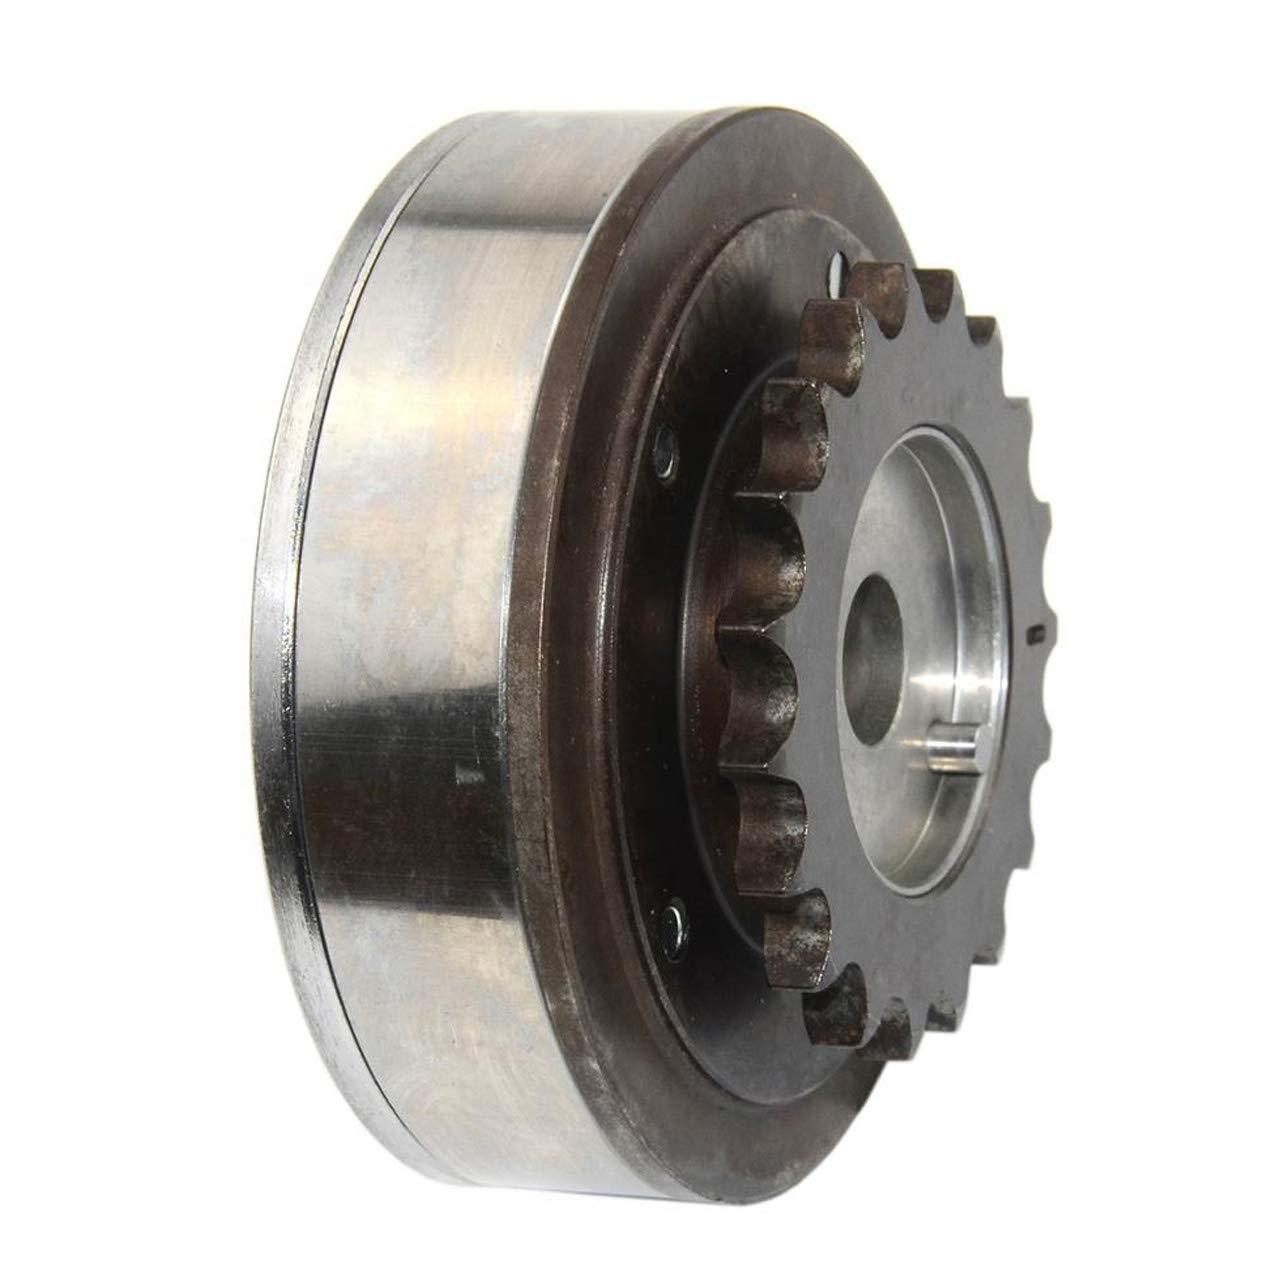 ZDTOPA OEM Parts 06F109088J Camshaft Adjuster for 05-14 AUDI A3 A4 TT VW EOS GTI Passat